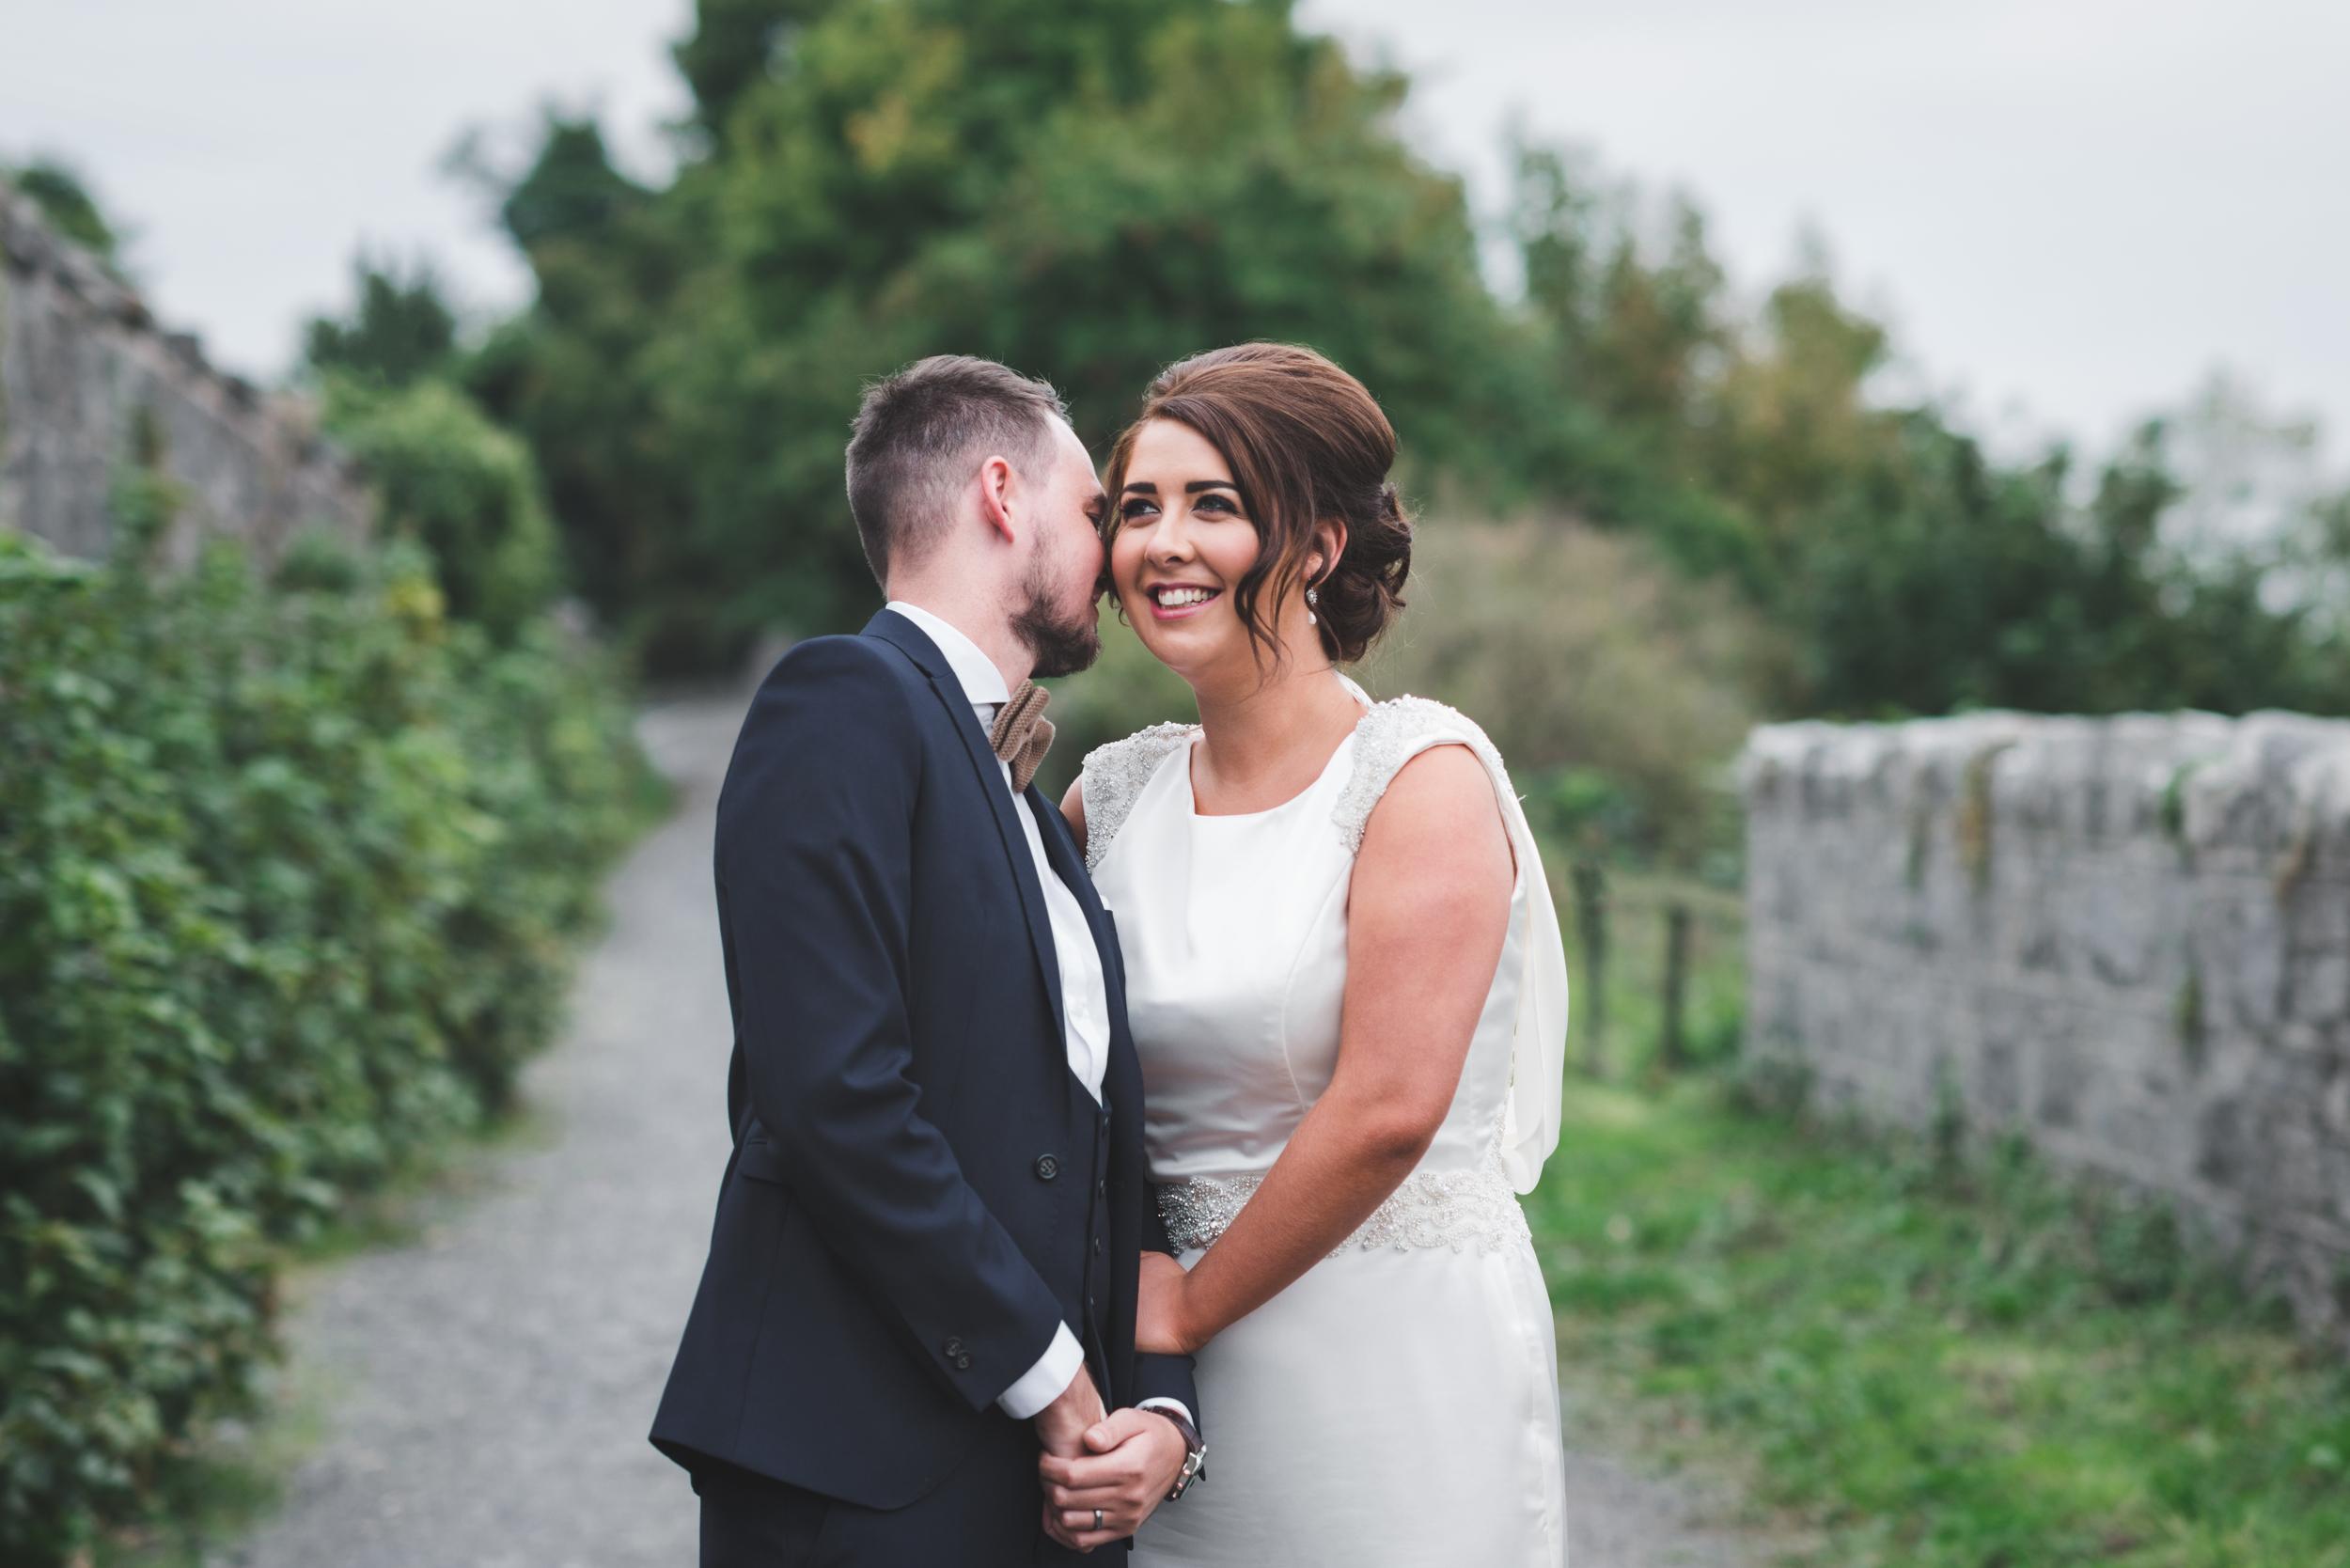 Wedding_Photographer_Purephotoni_Weavers_Lodge_whisper_secret